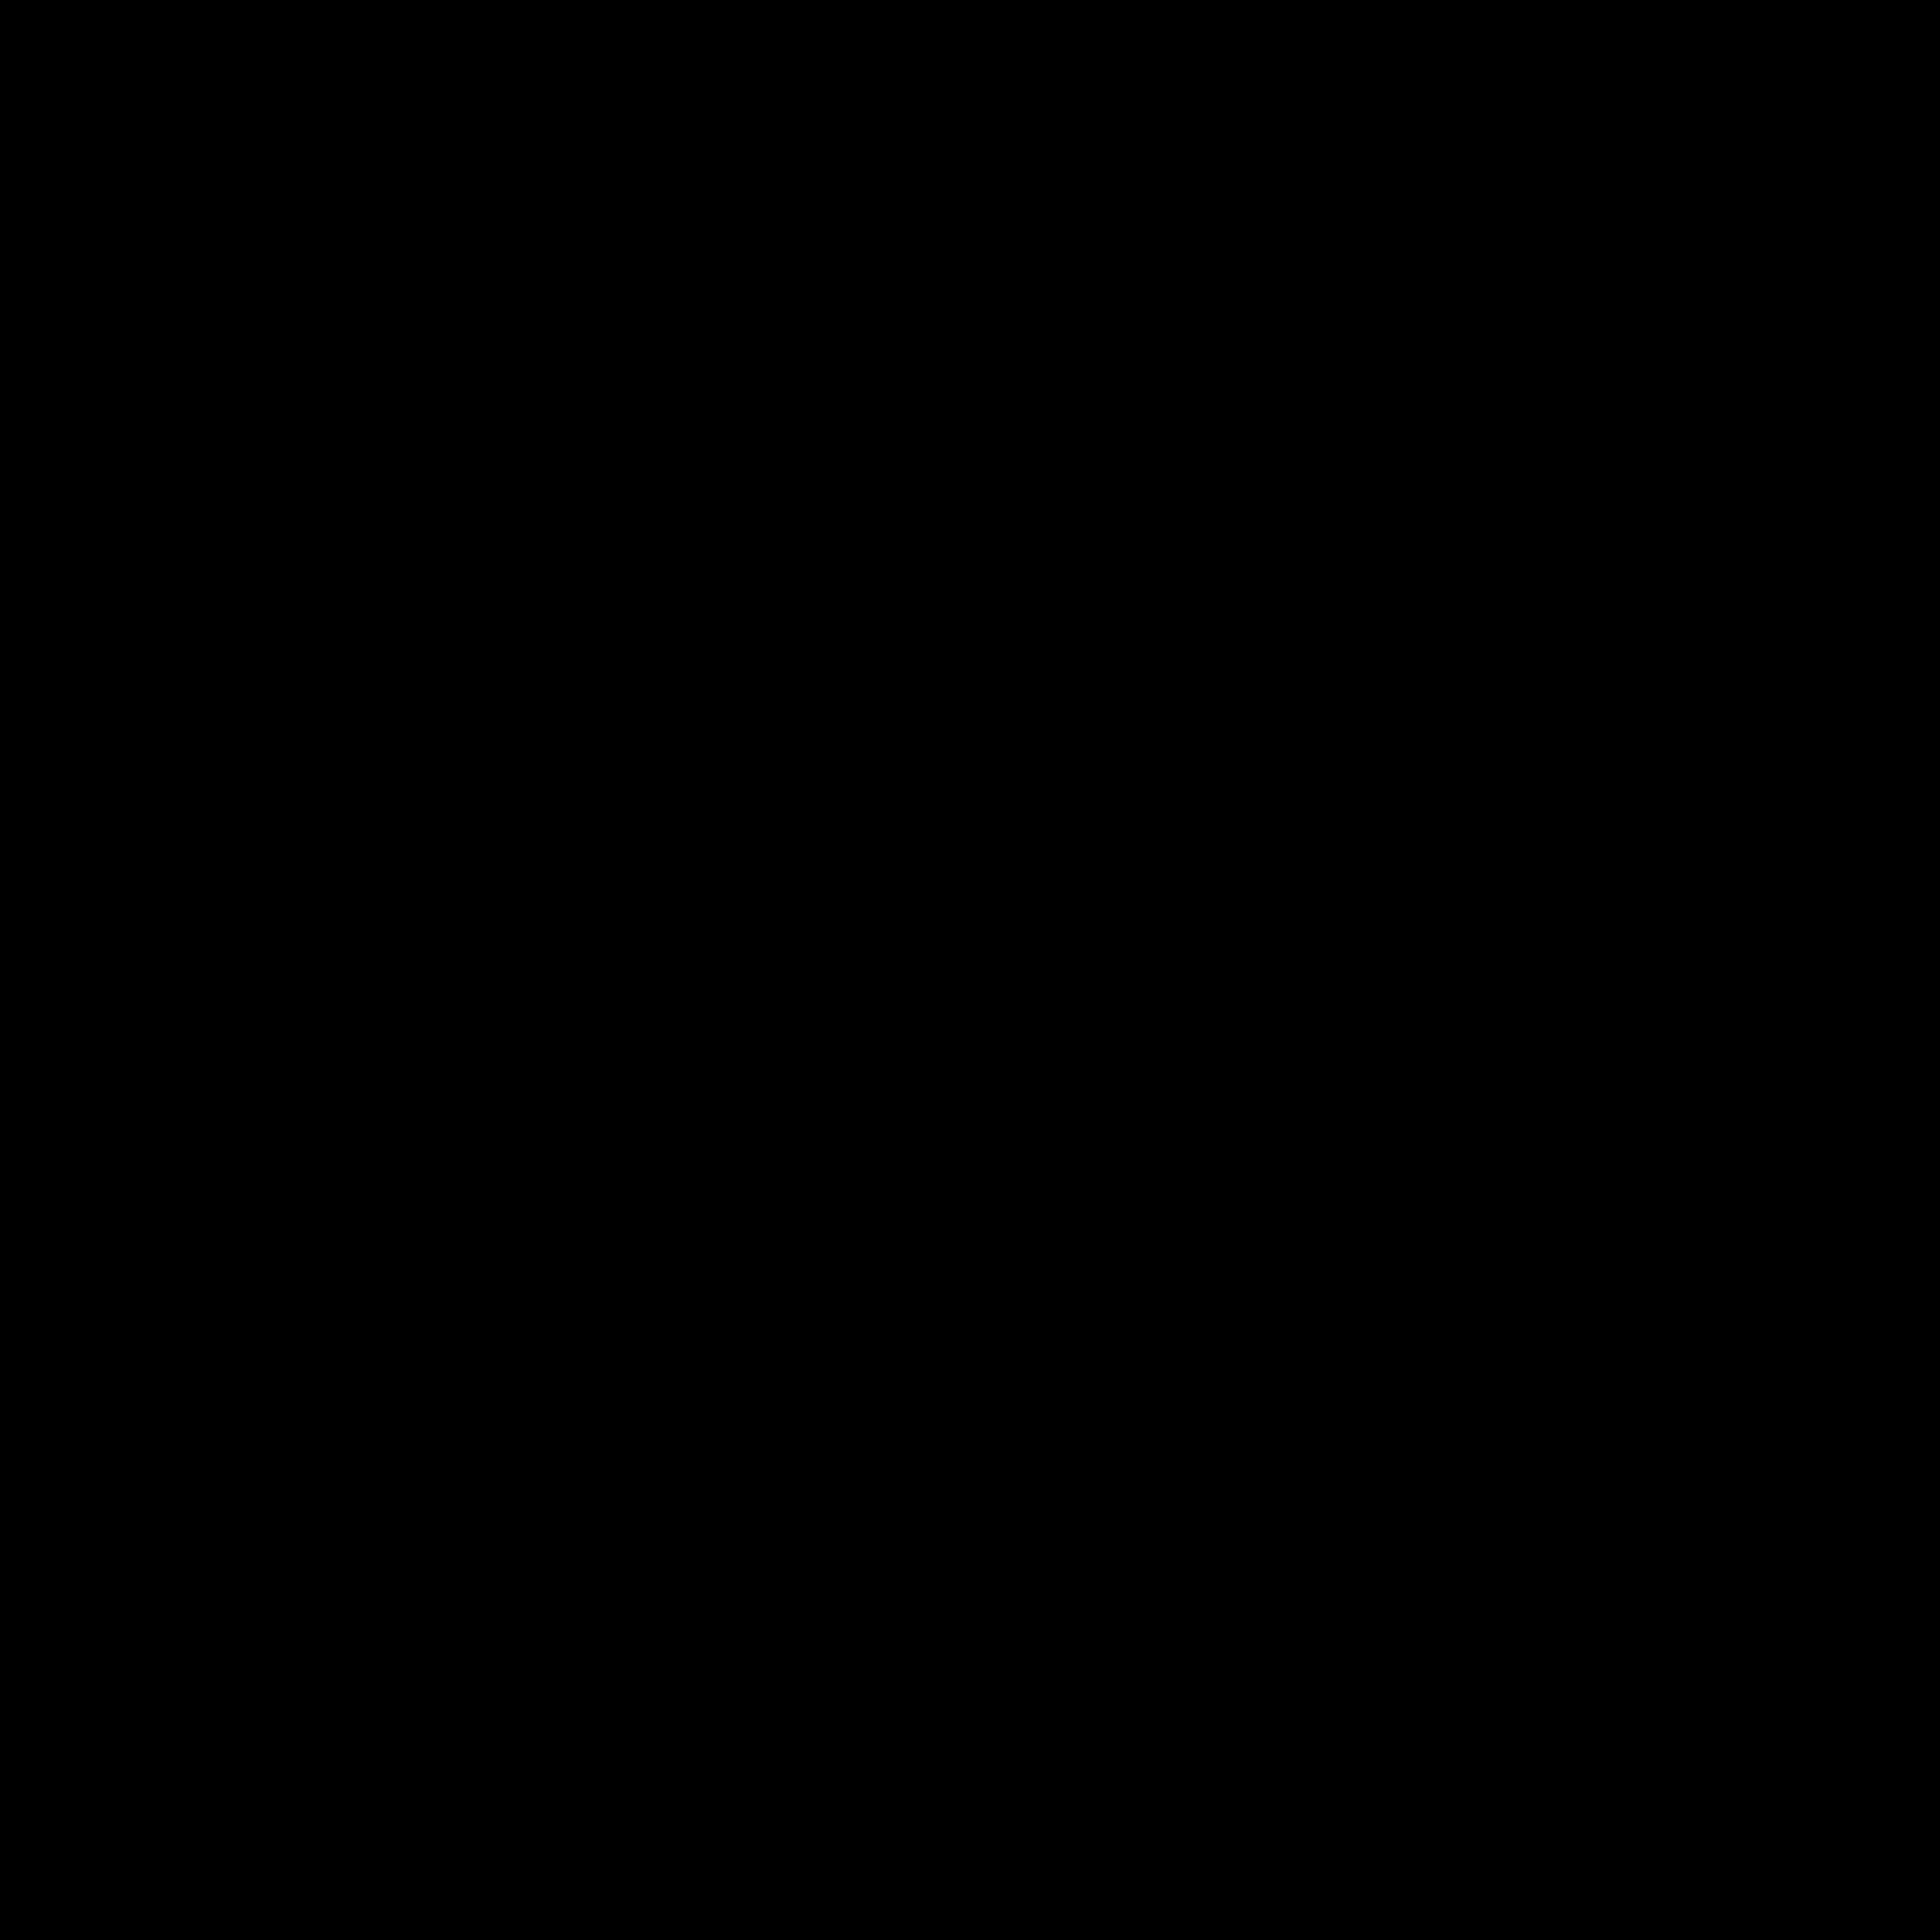 American national insurance logo clipart svg freeuse library Guaranty National Insurance Logo PNG Transparent & SVG Vector ... svg freeuse library